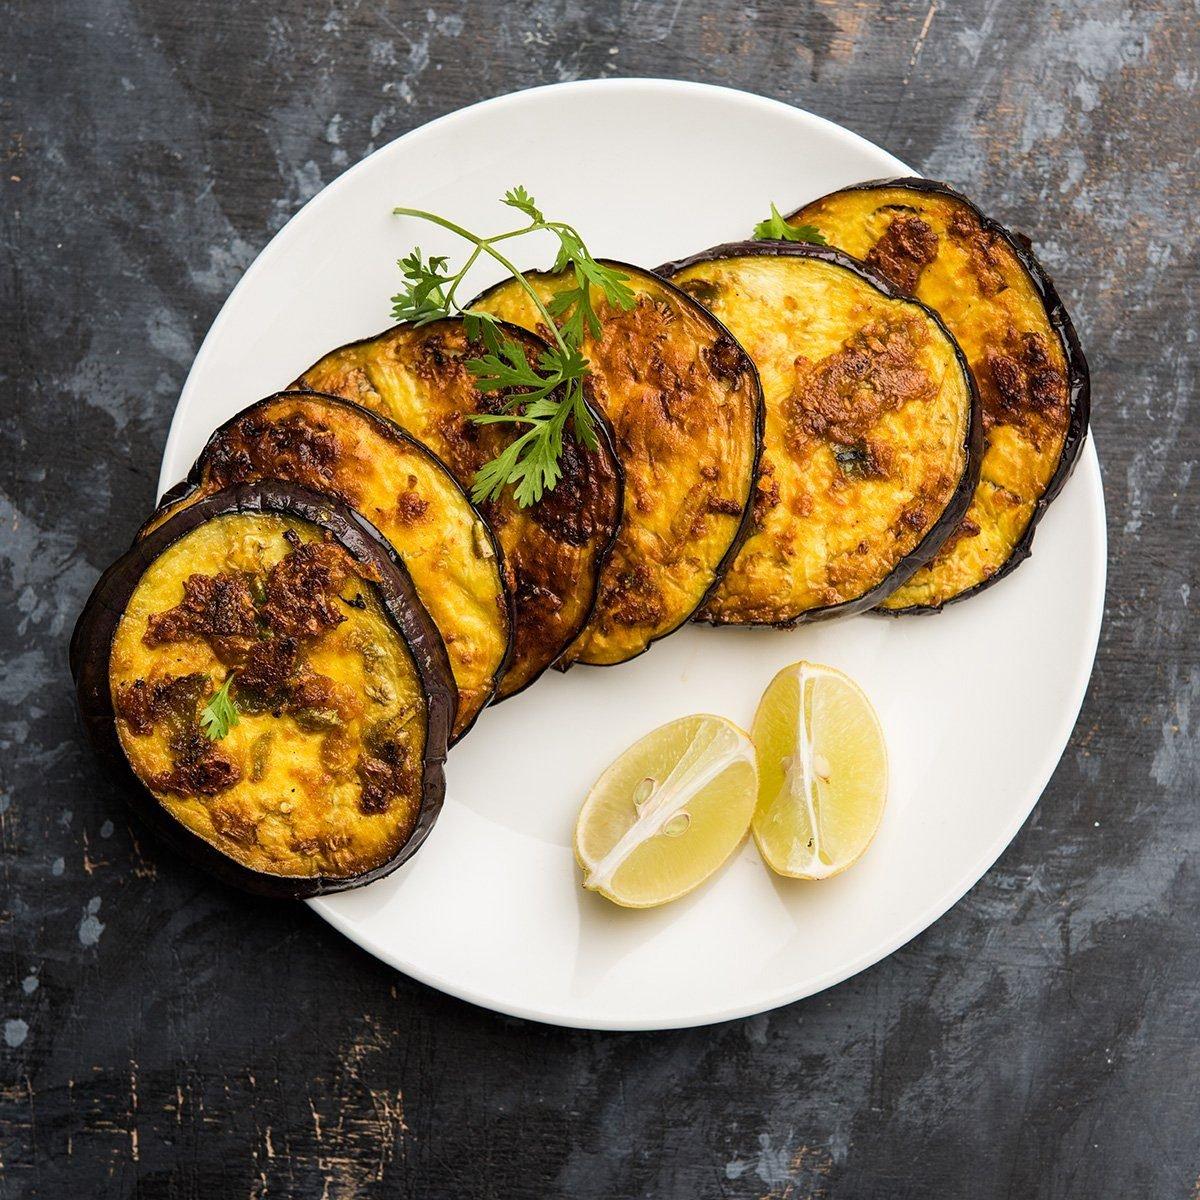 Pan fry crispy baigan / eggplant / brinjal recipe from India.